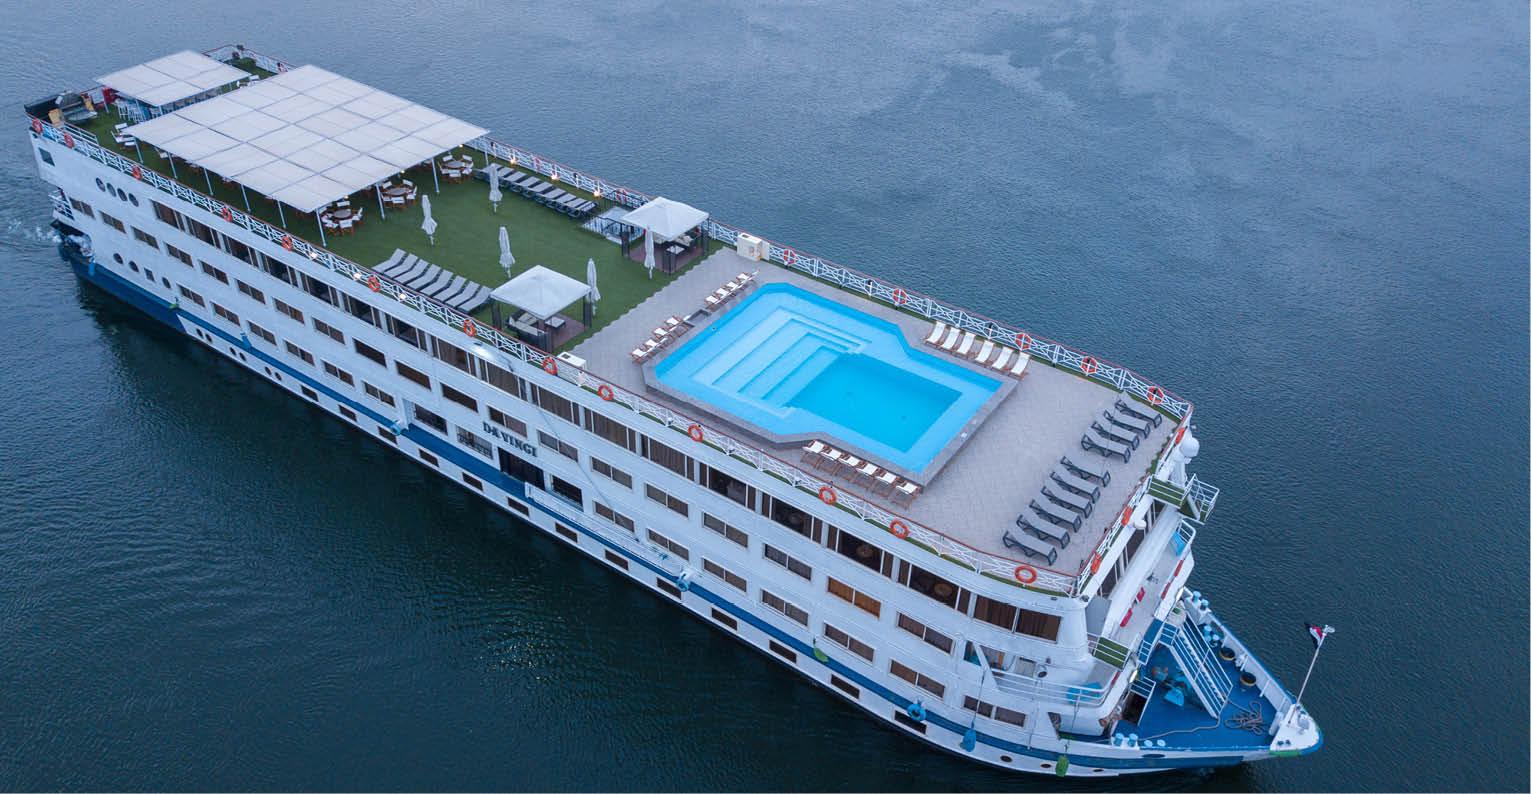 Circuit Coeur de lEgypte - Top Clubs Cruise M/S Da Vinci 5* - Egypte